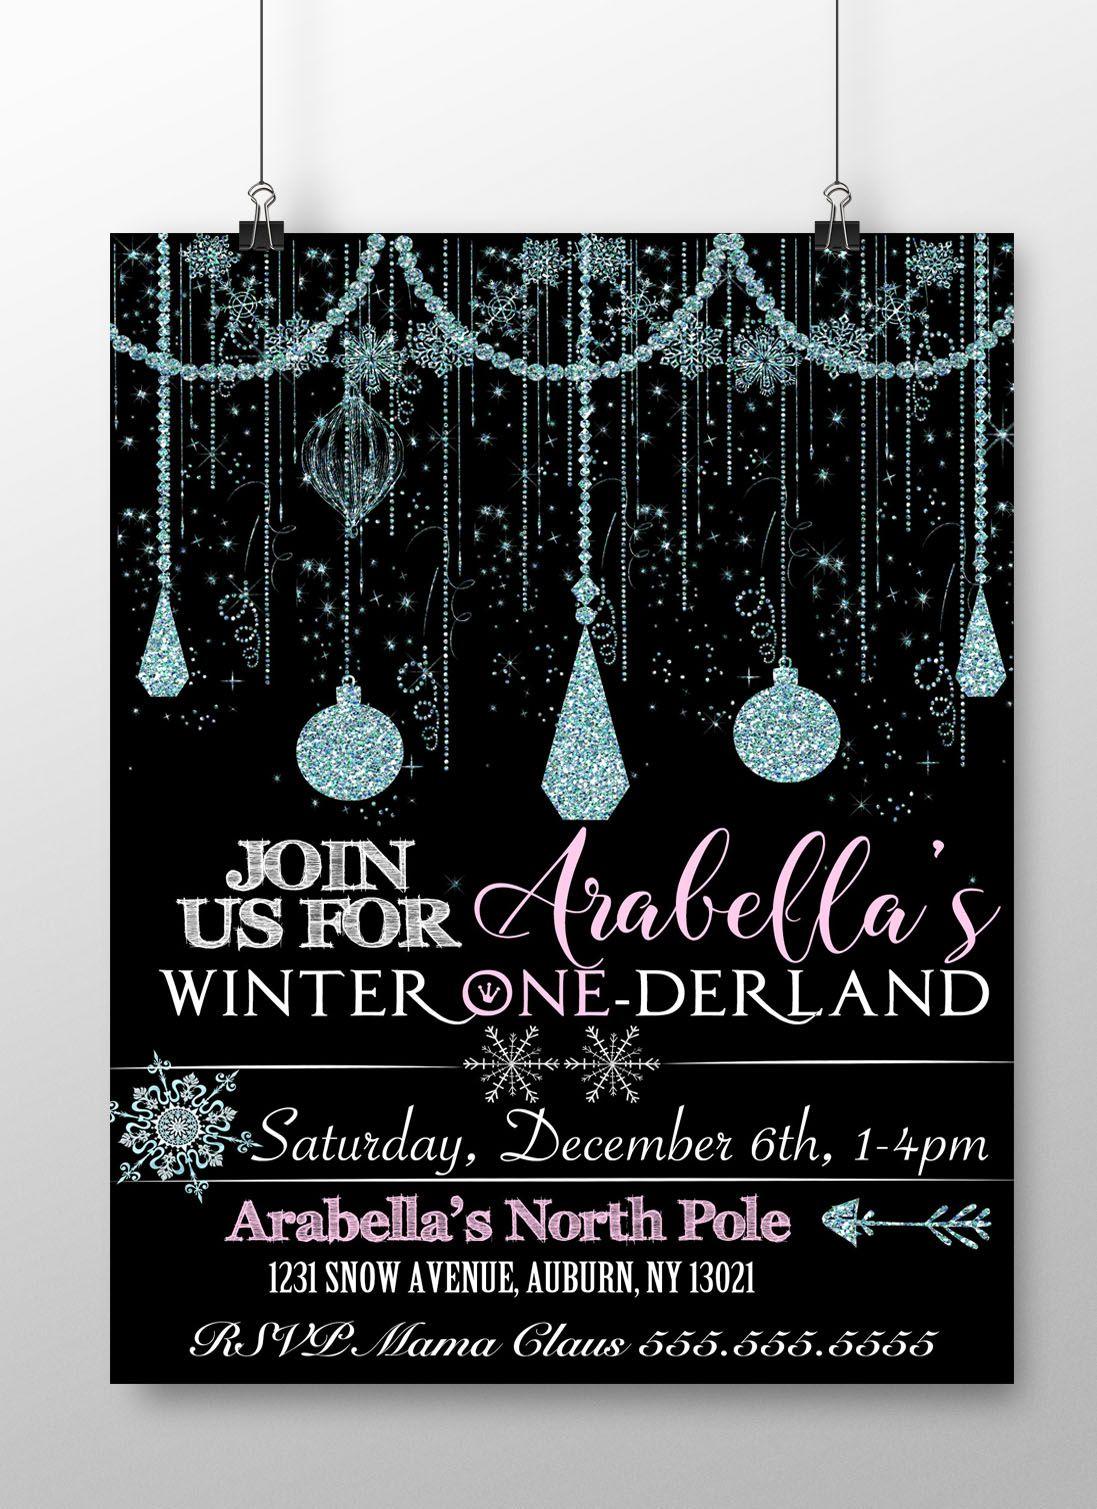 Classy Winter Wonderland Invite, winter onederland invitations ...